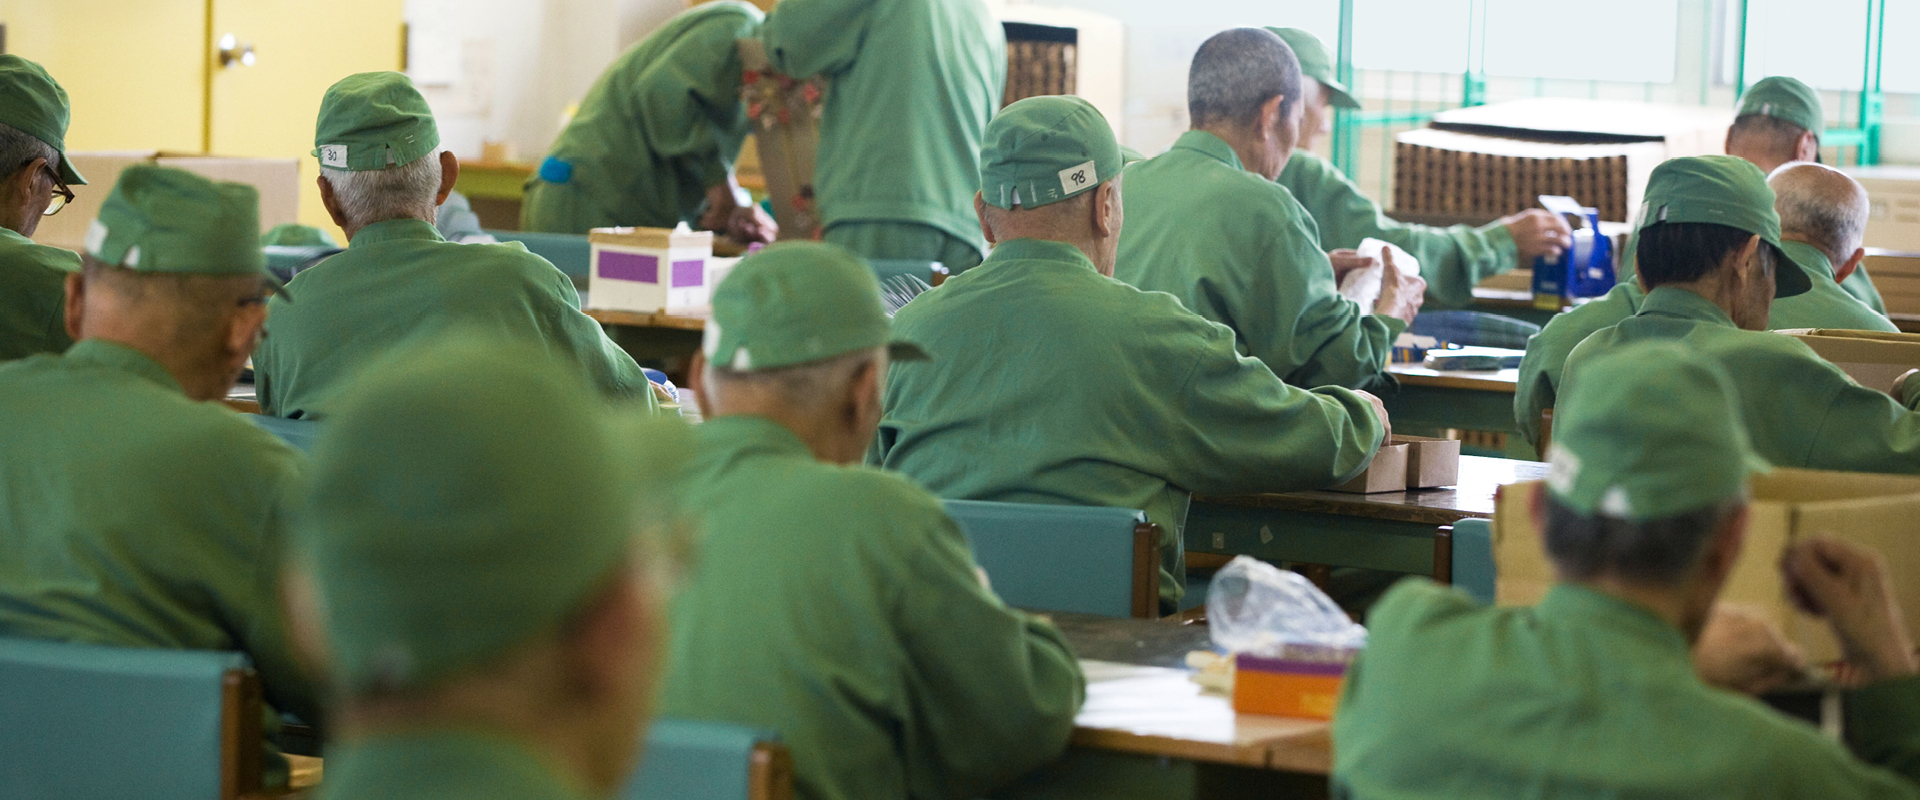 PRI_DMT Older prisoners_web-banner